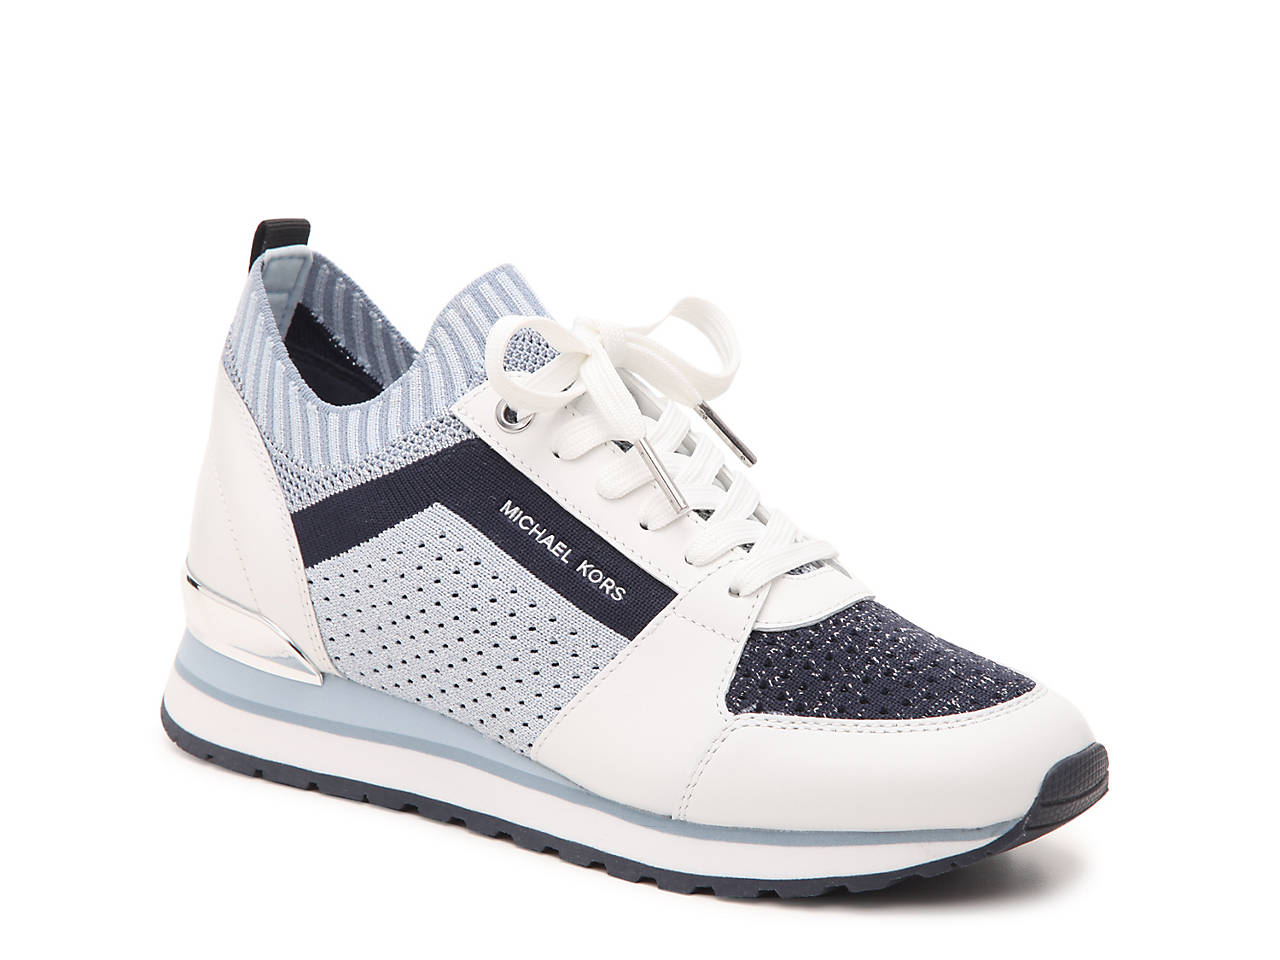 official supplier best price suitable for men/women Billie Sneaker